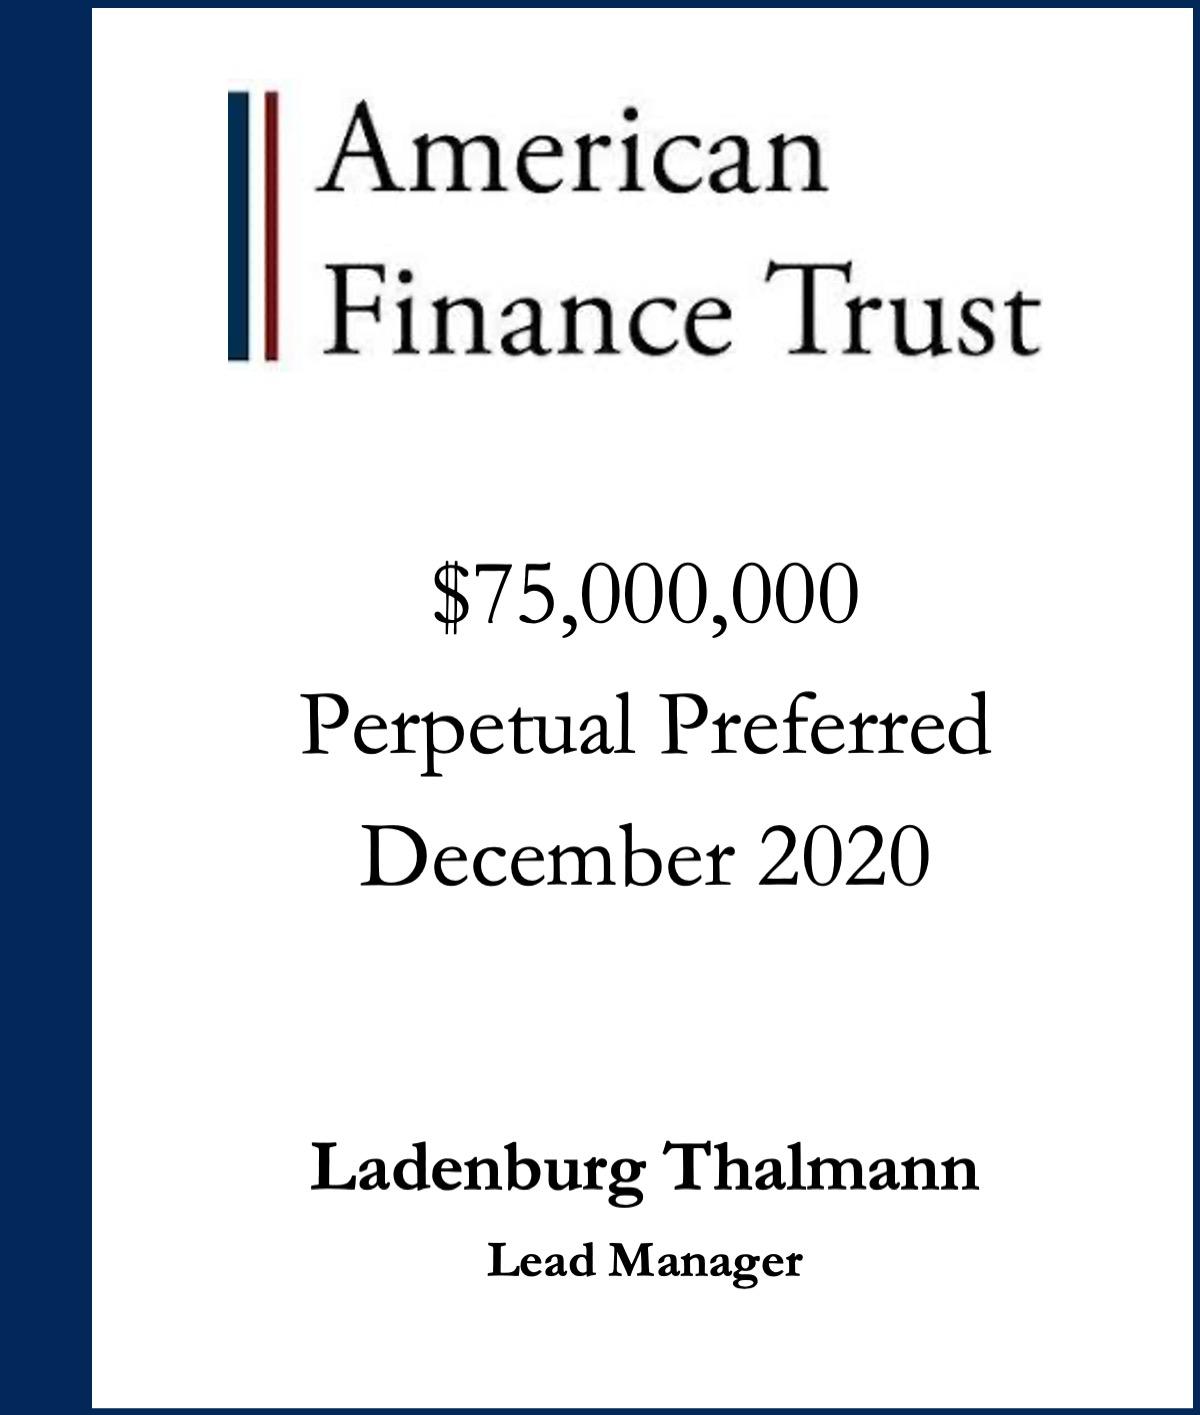 American Finance Trust